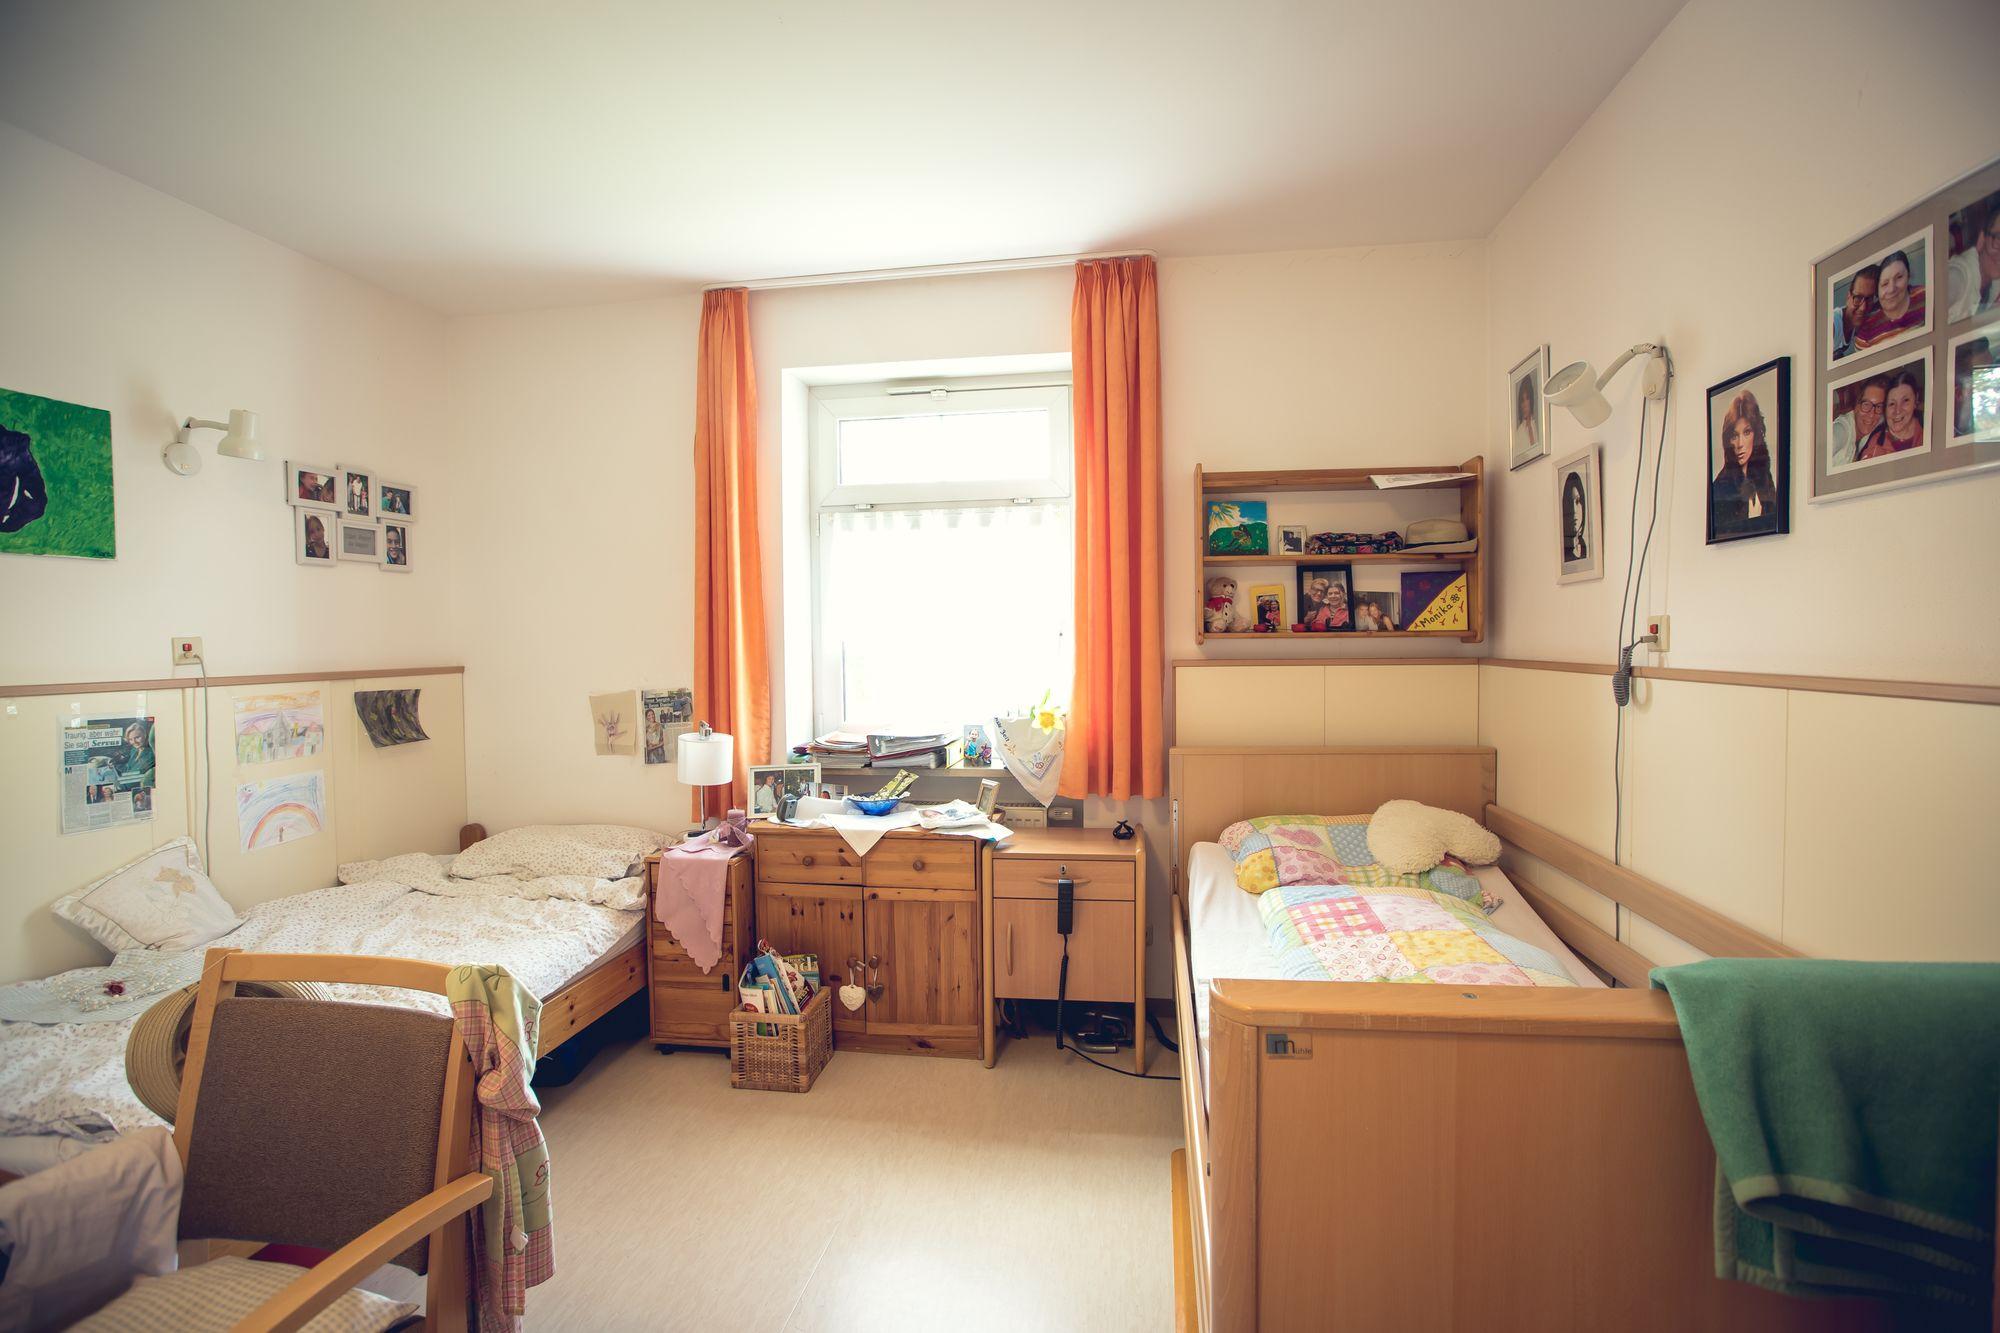 ehrko-wohnzentrum_az1i6579.jpg